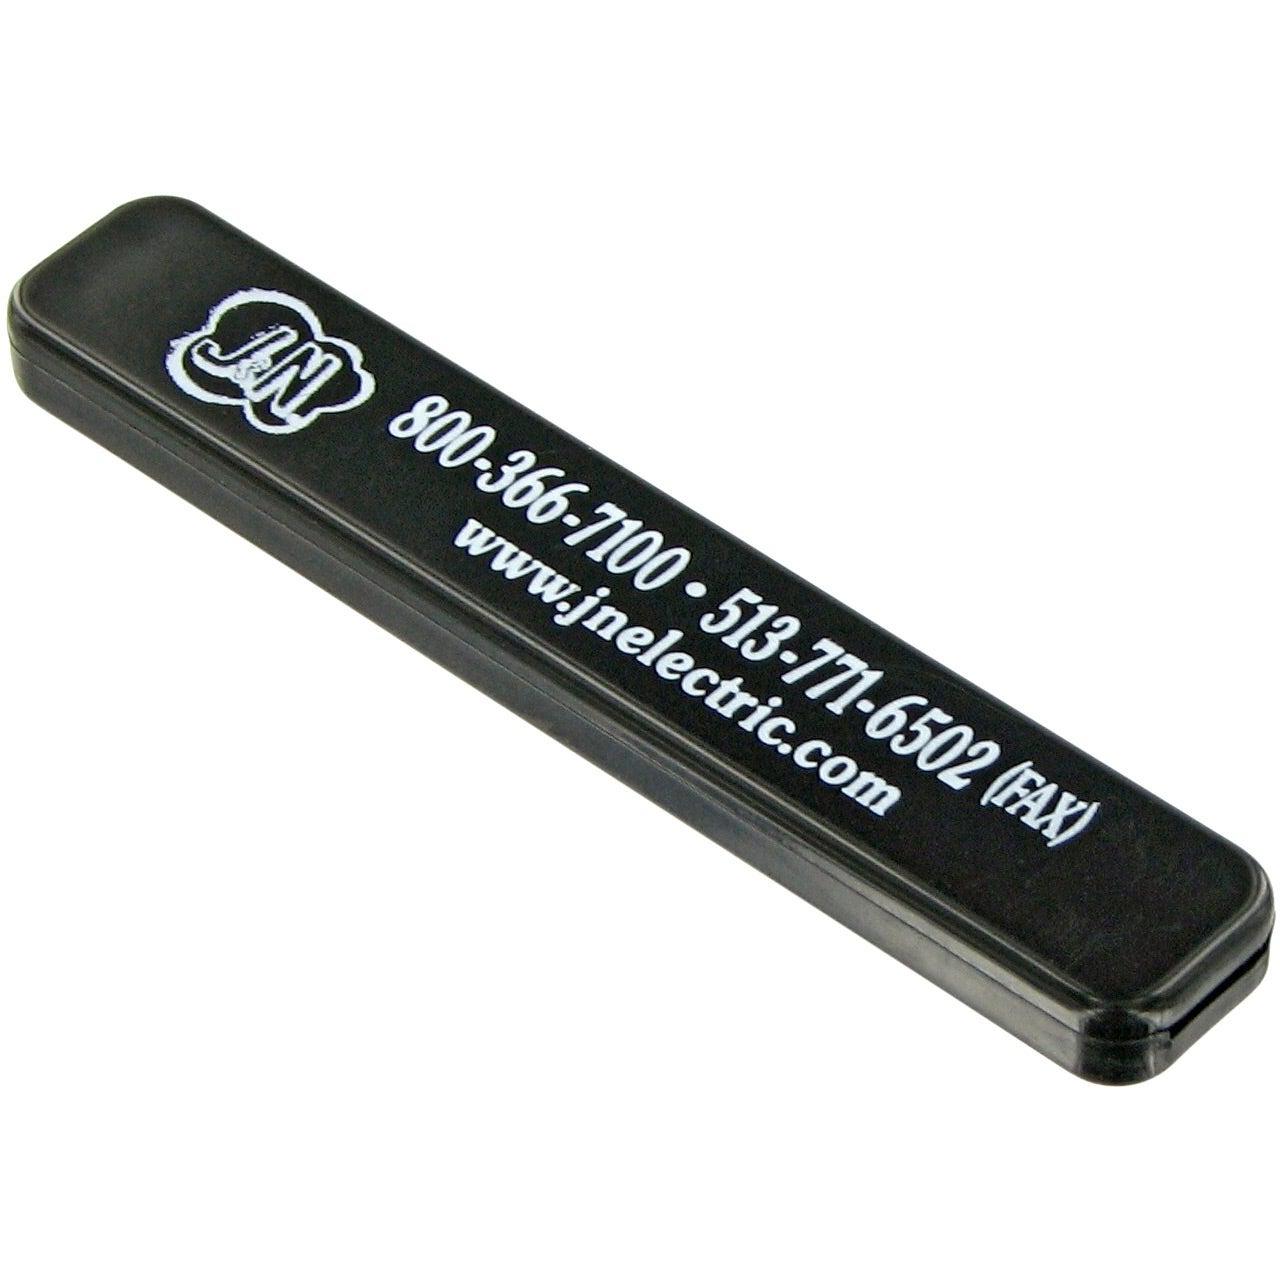 Companion Slide Blade Pocket Knife